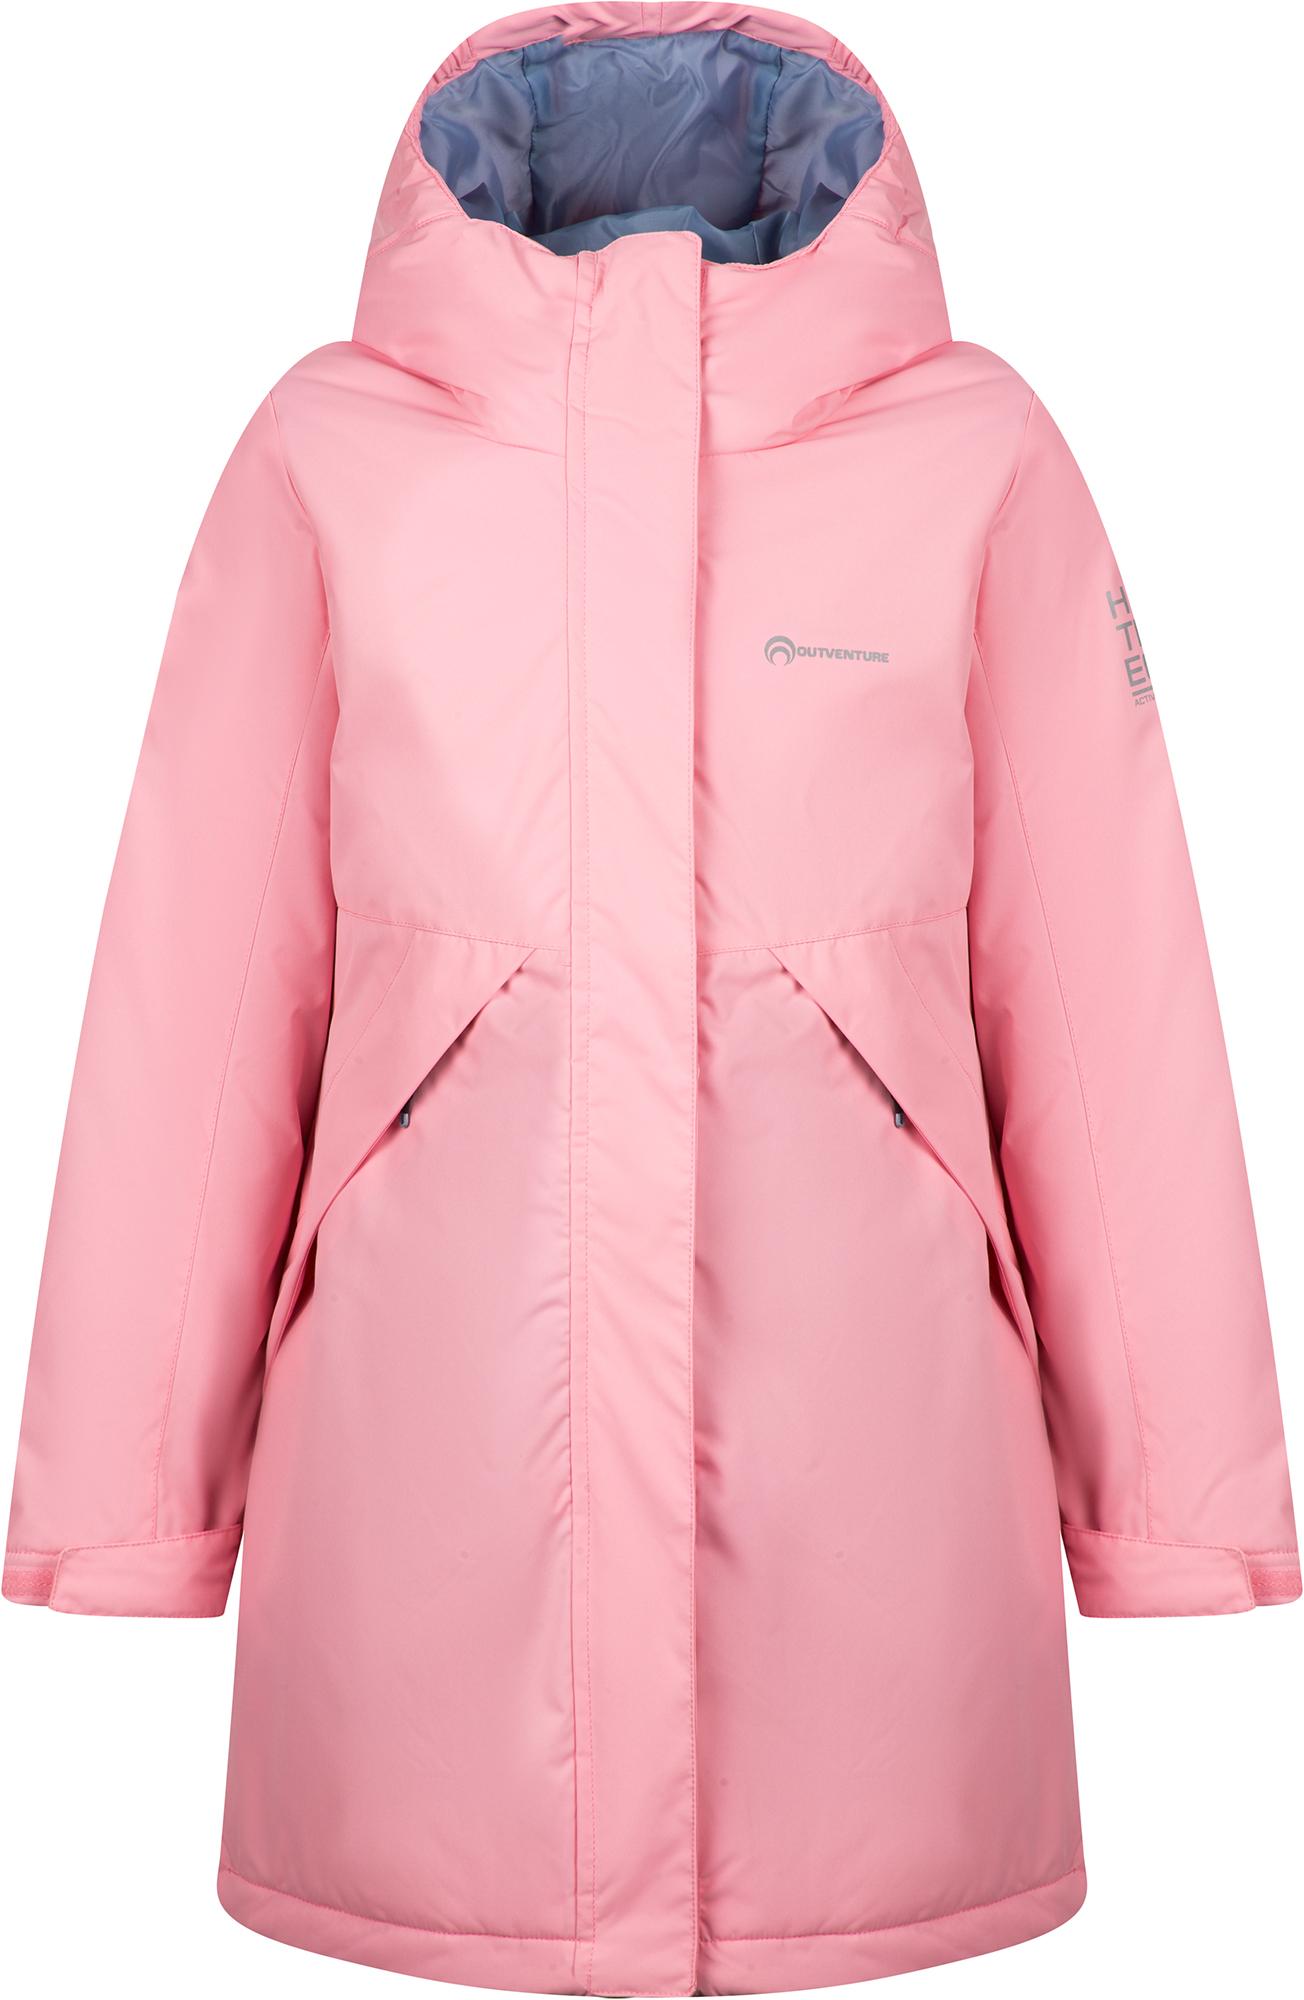 цена на Outventure Куртка утепленная для девочек Outventure, размер 152